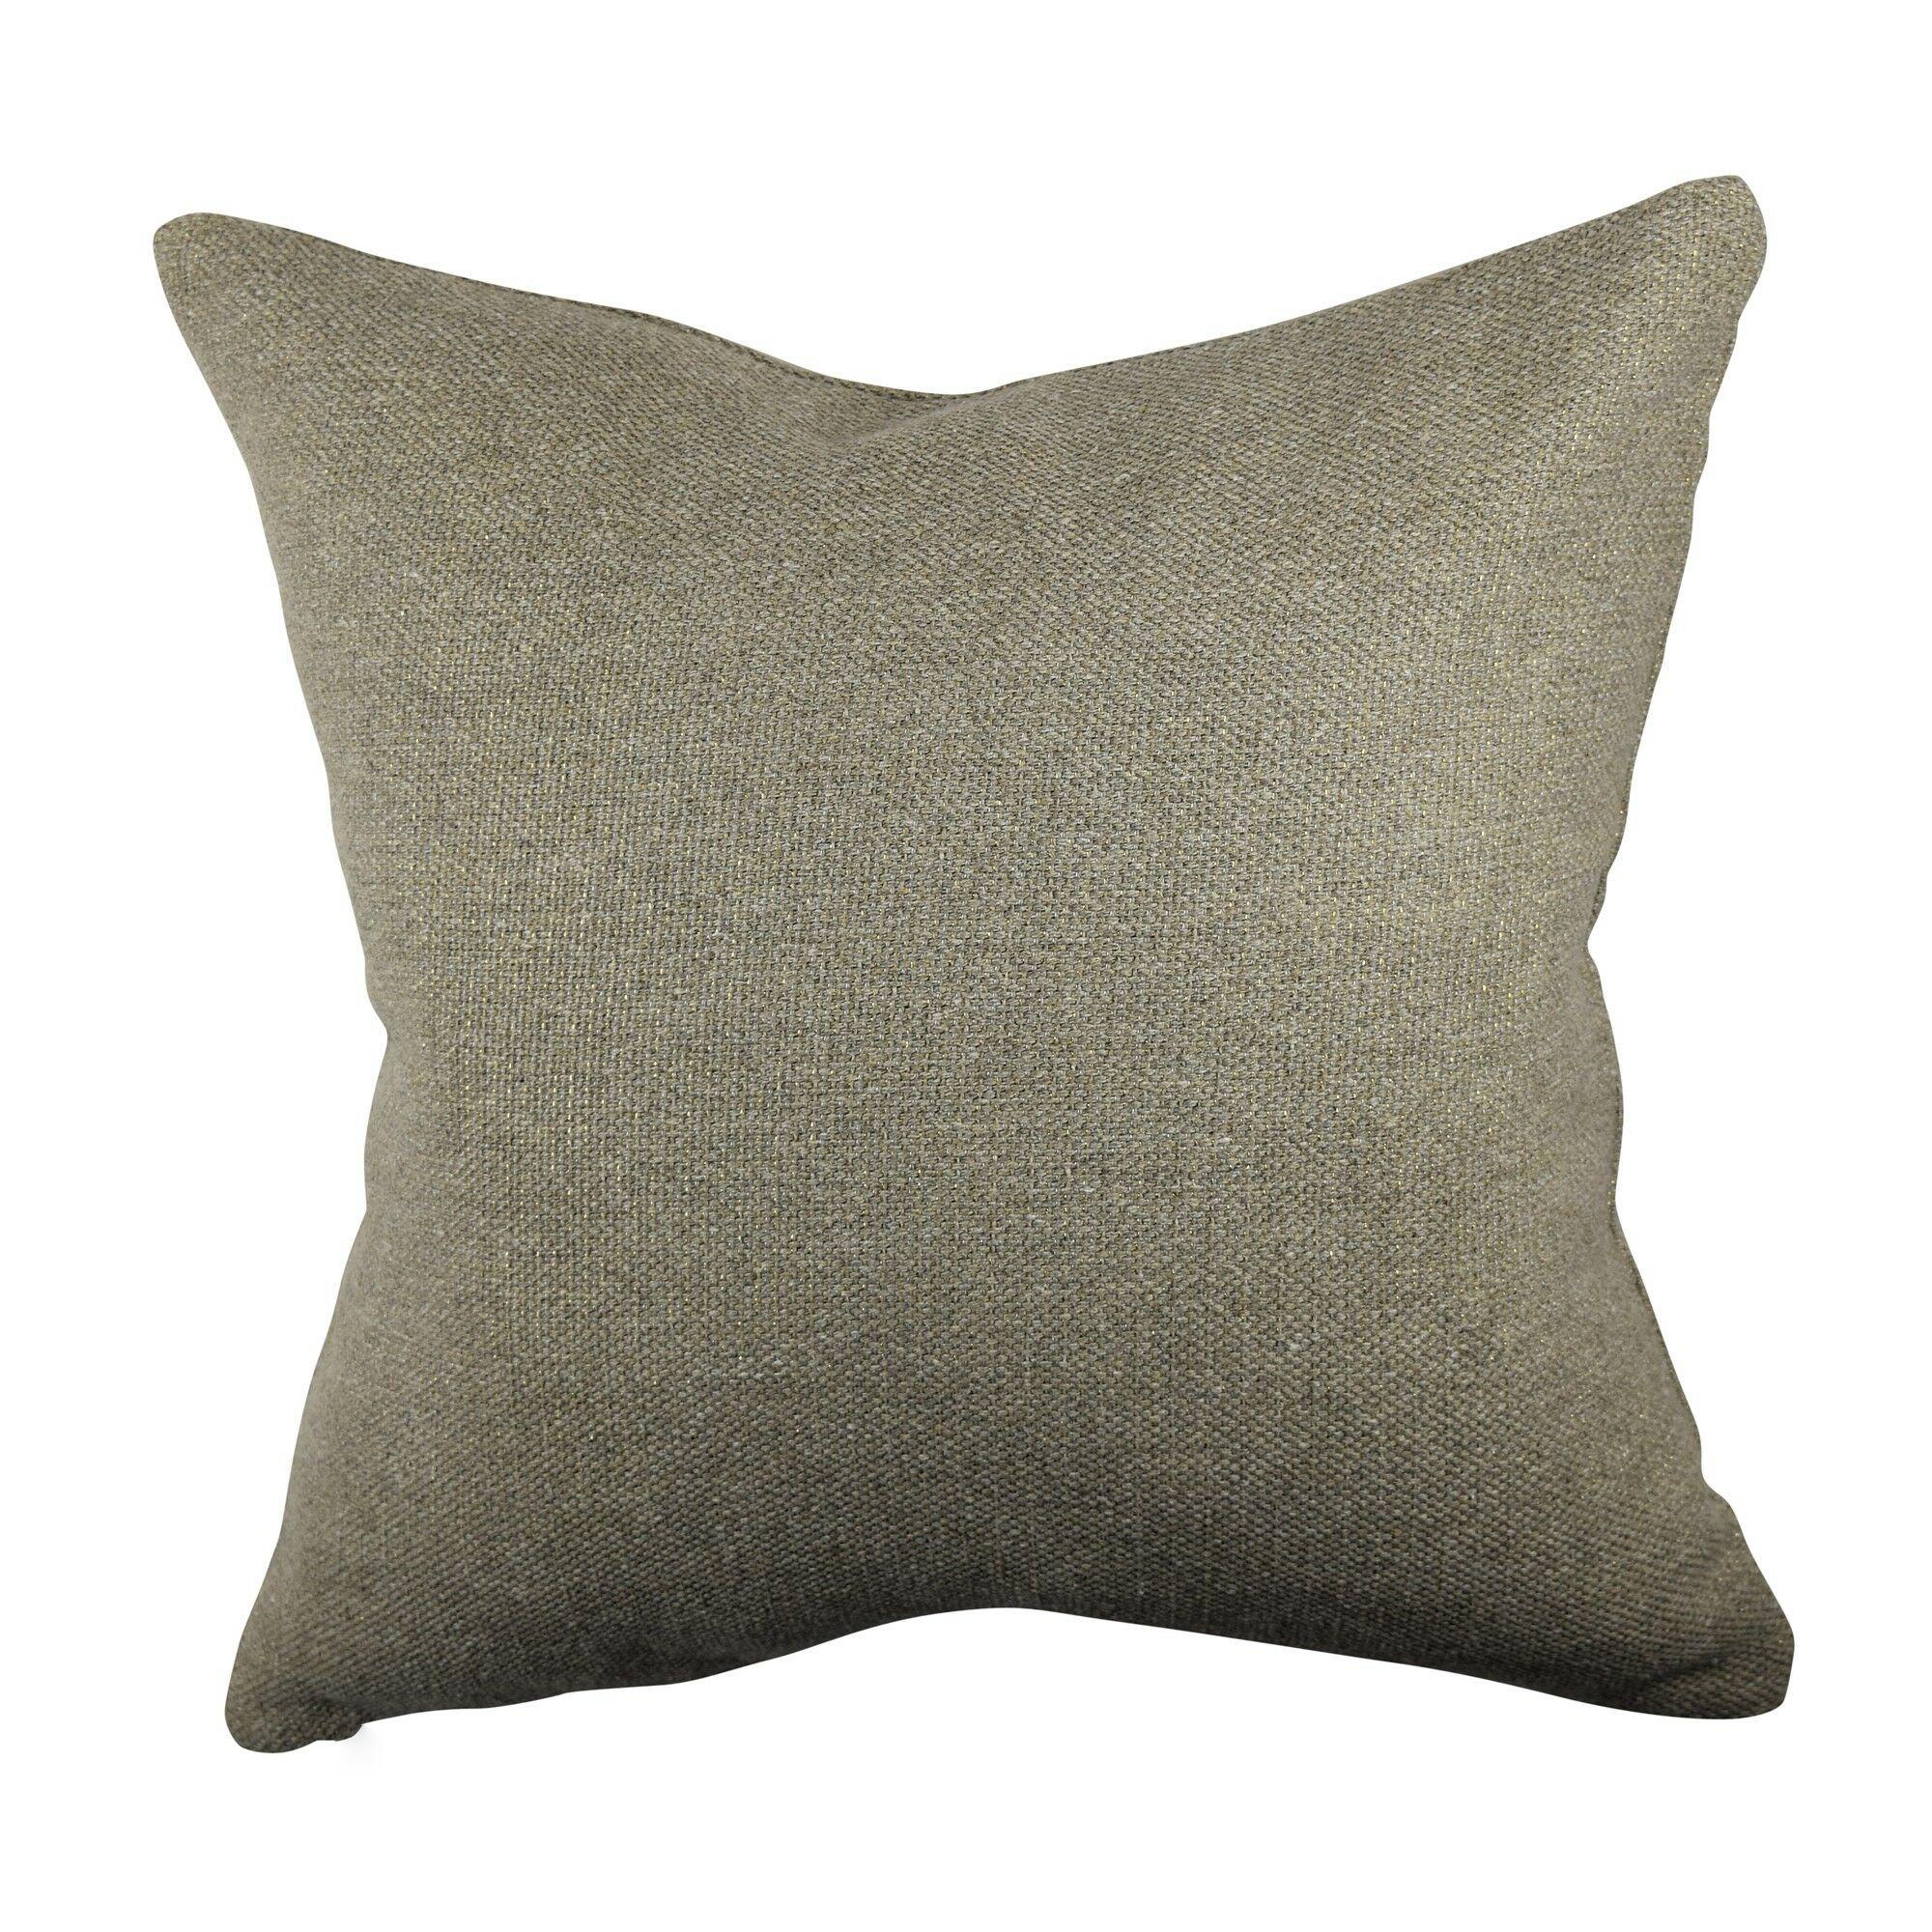 Designer Throw Pillow Size: 18